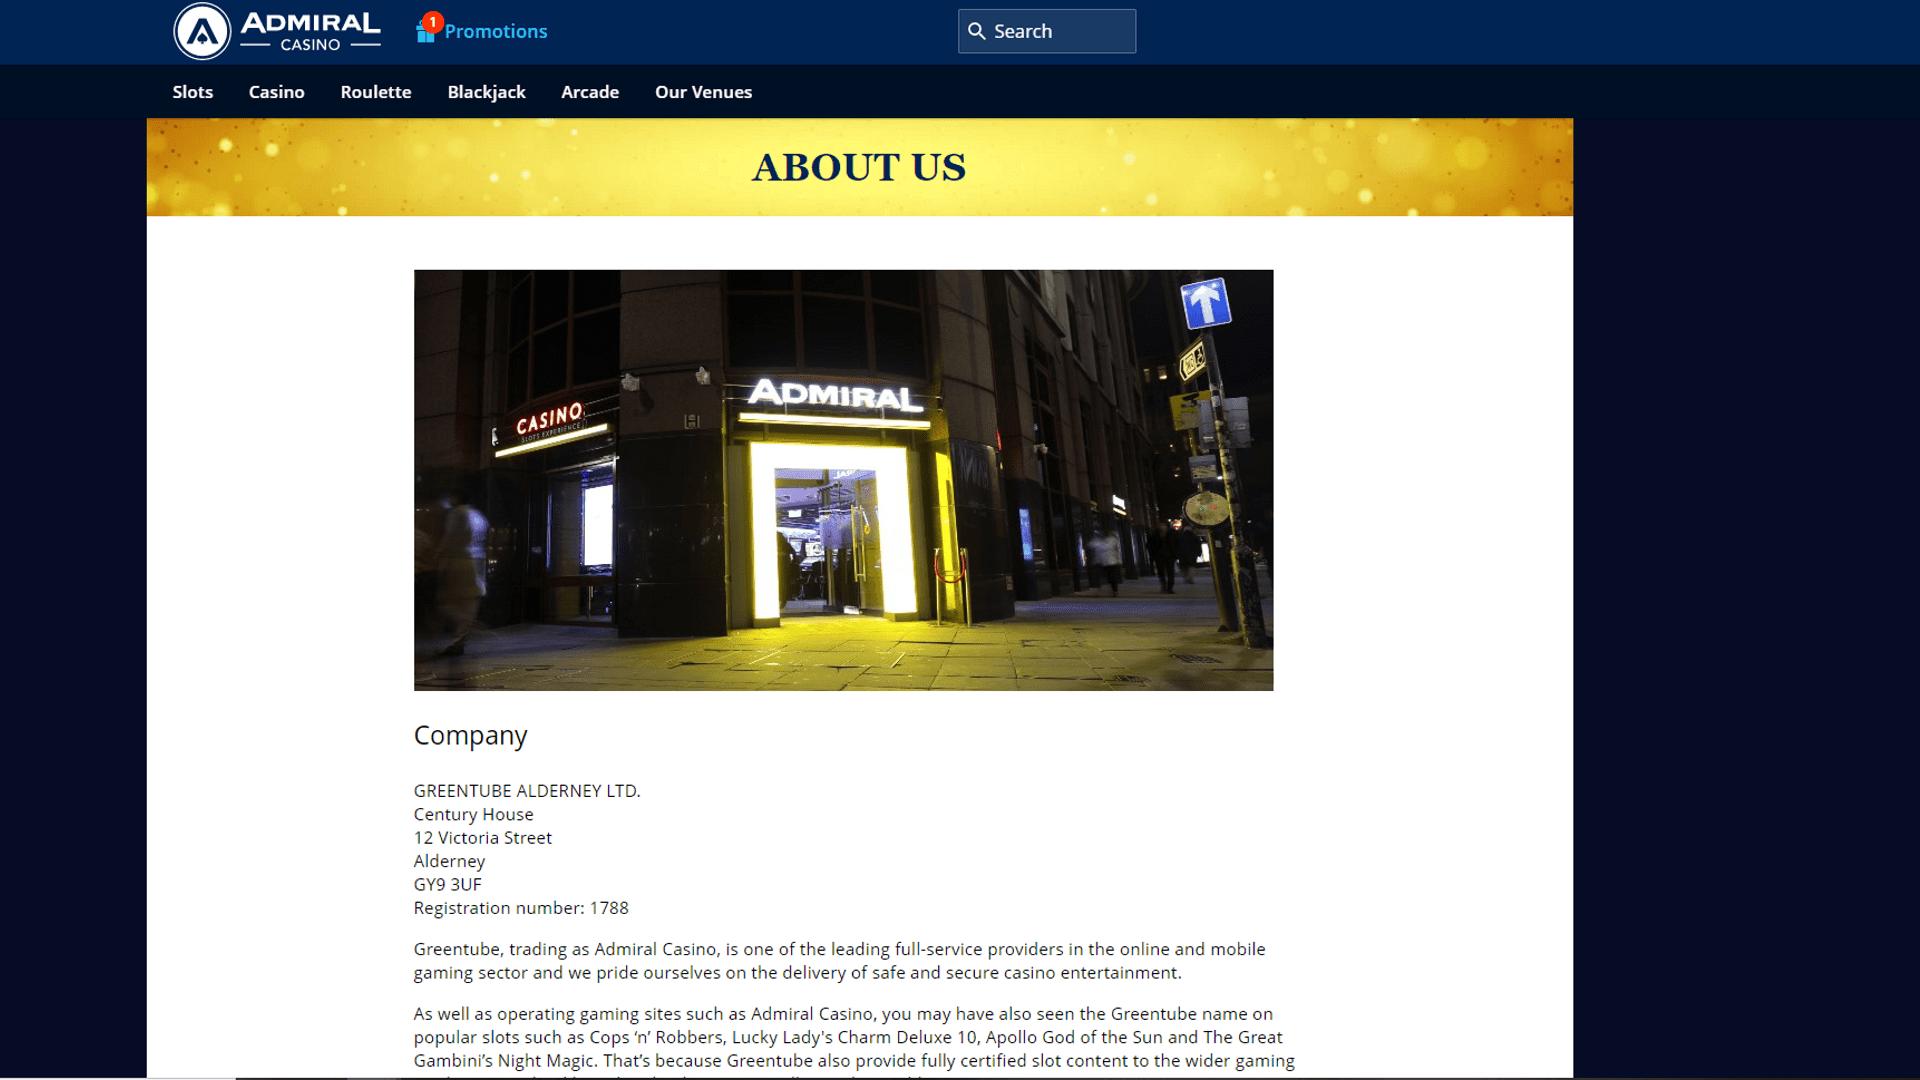 Адмирал казино промокод онлайн игровые аппараты гранд-при